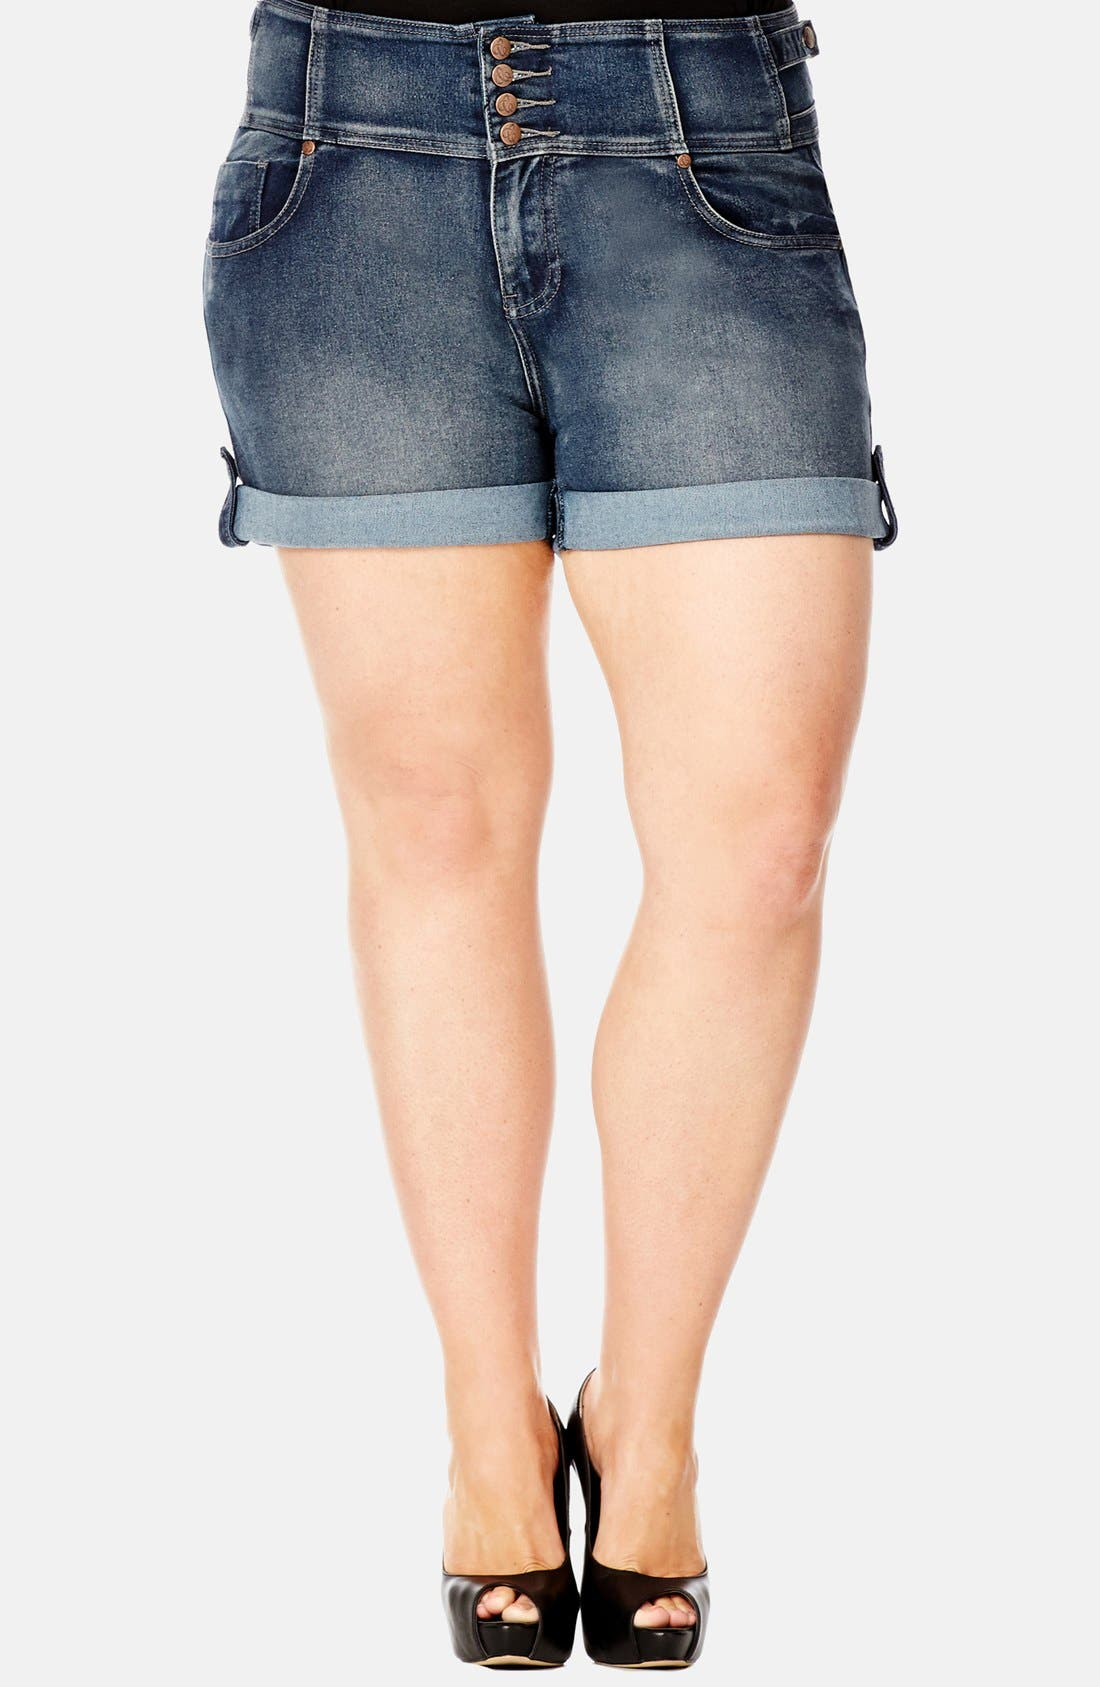 Alternate Image 1 Selected - City Chic High Waist Stretch Denim Shorts (Dark) (Plus Size)